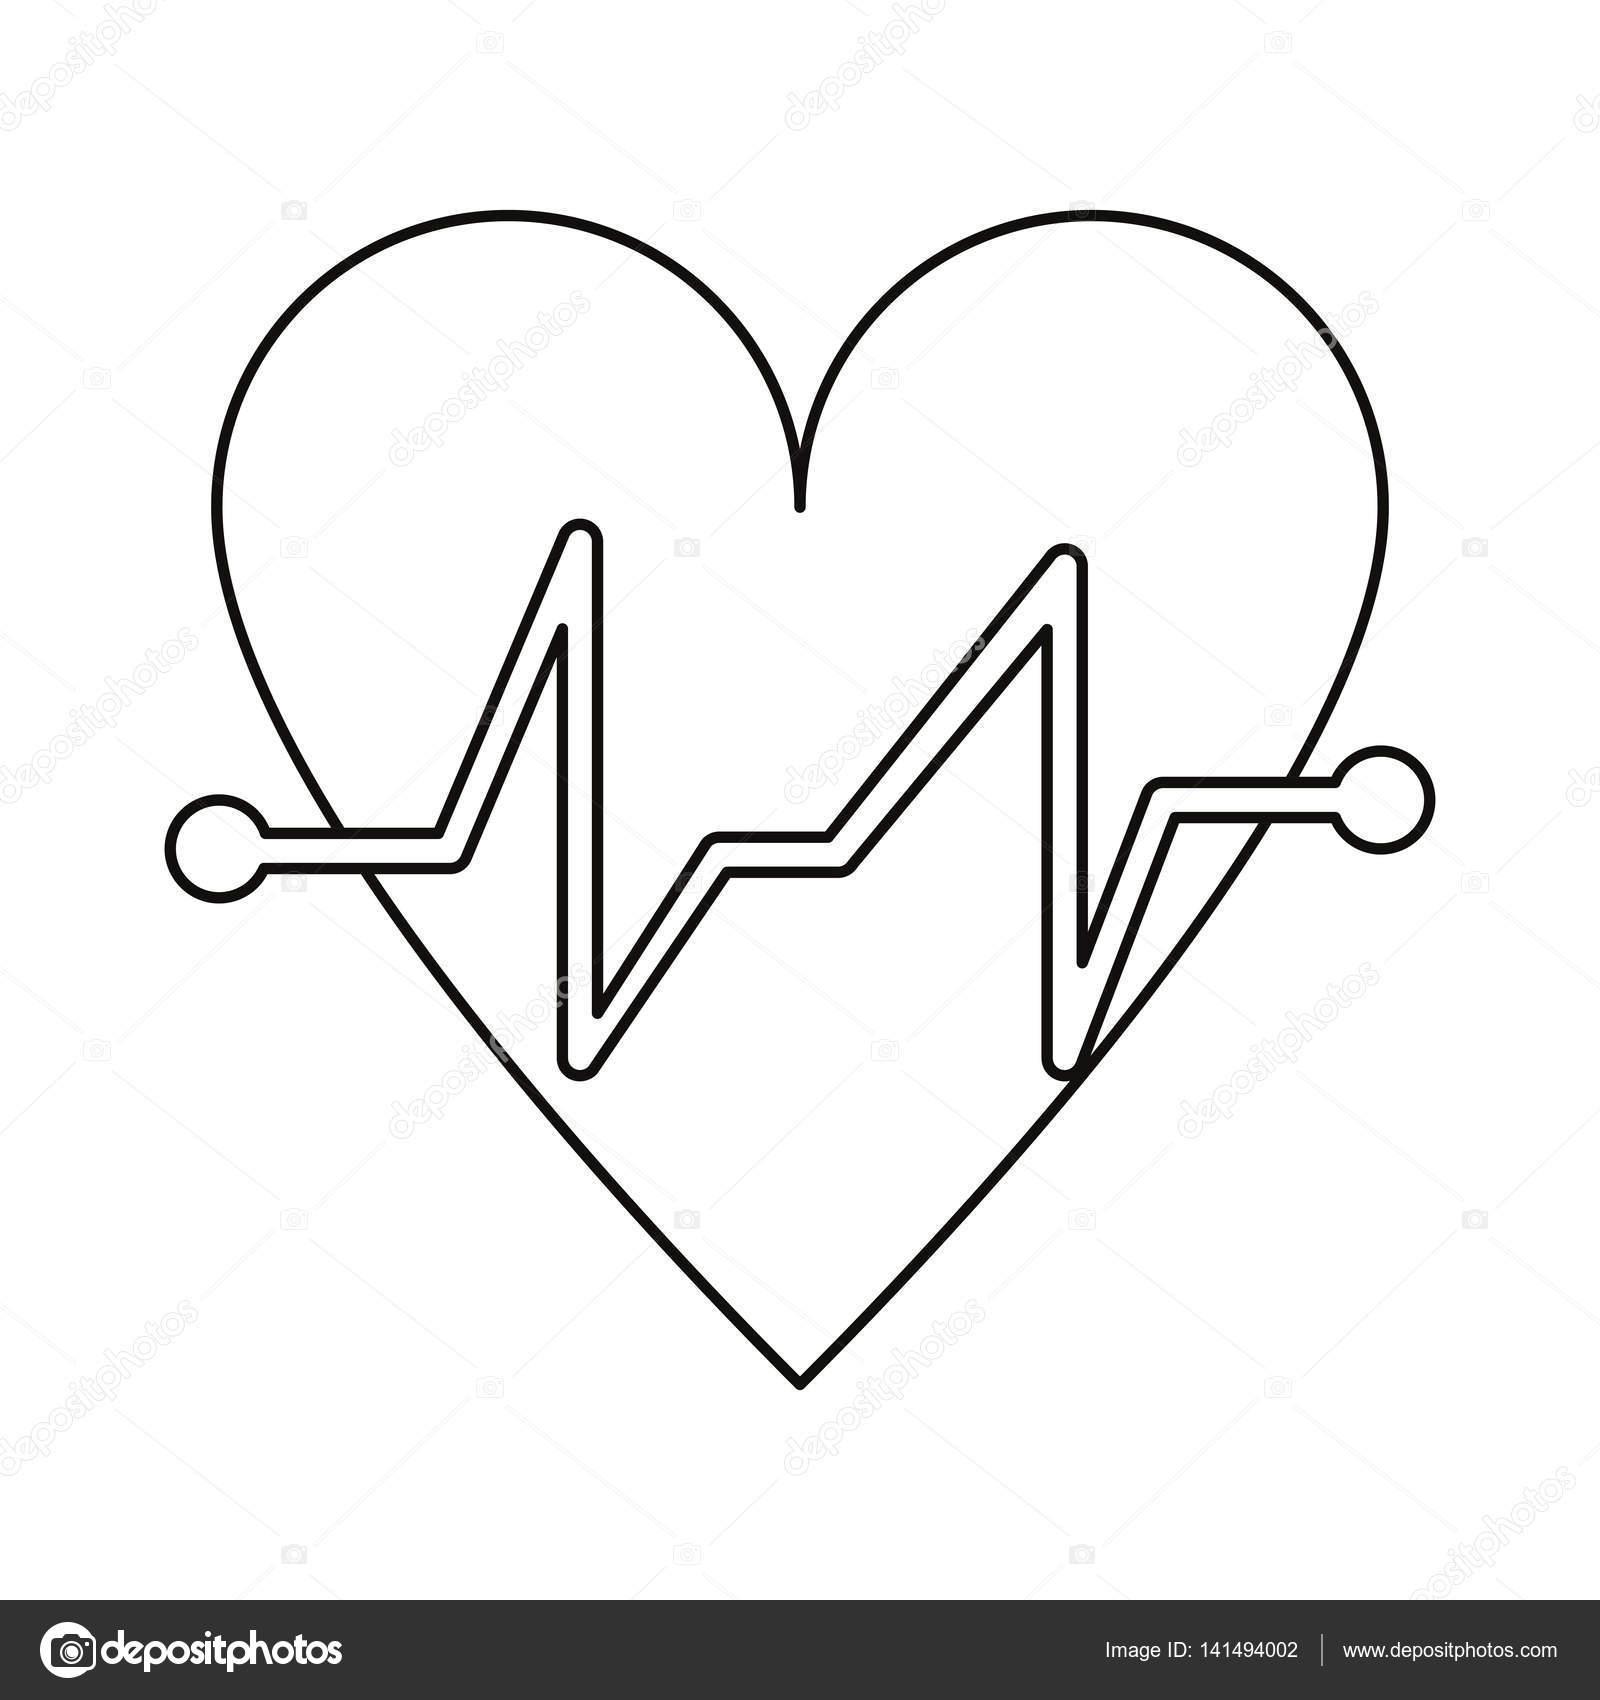 heart beat pulse cardiac medical thin line stock vector ECG Wave heart beat pulse cardiac medical thin line stock vector